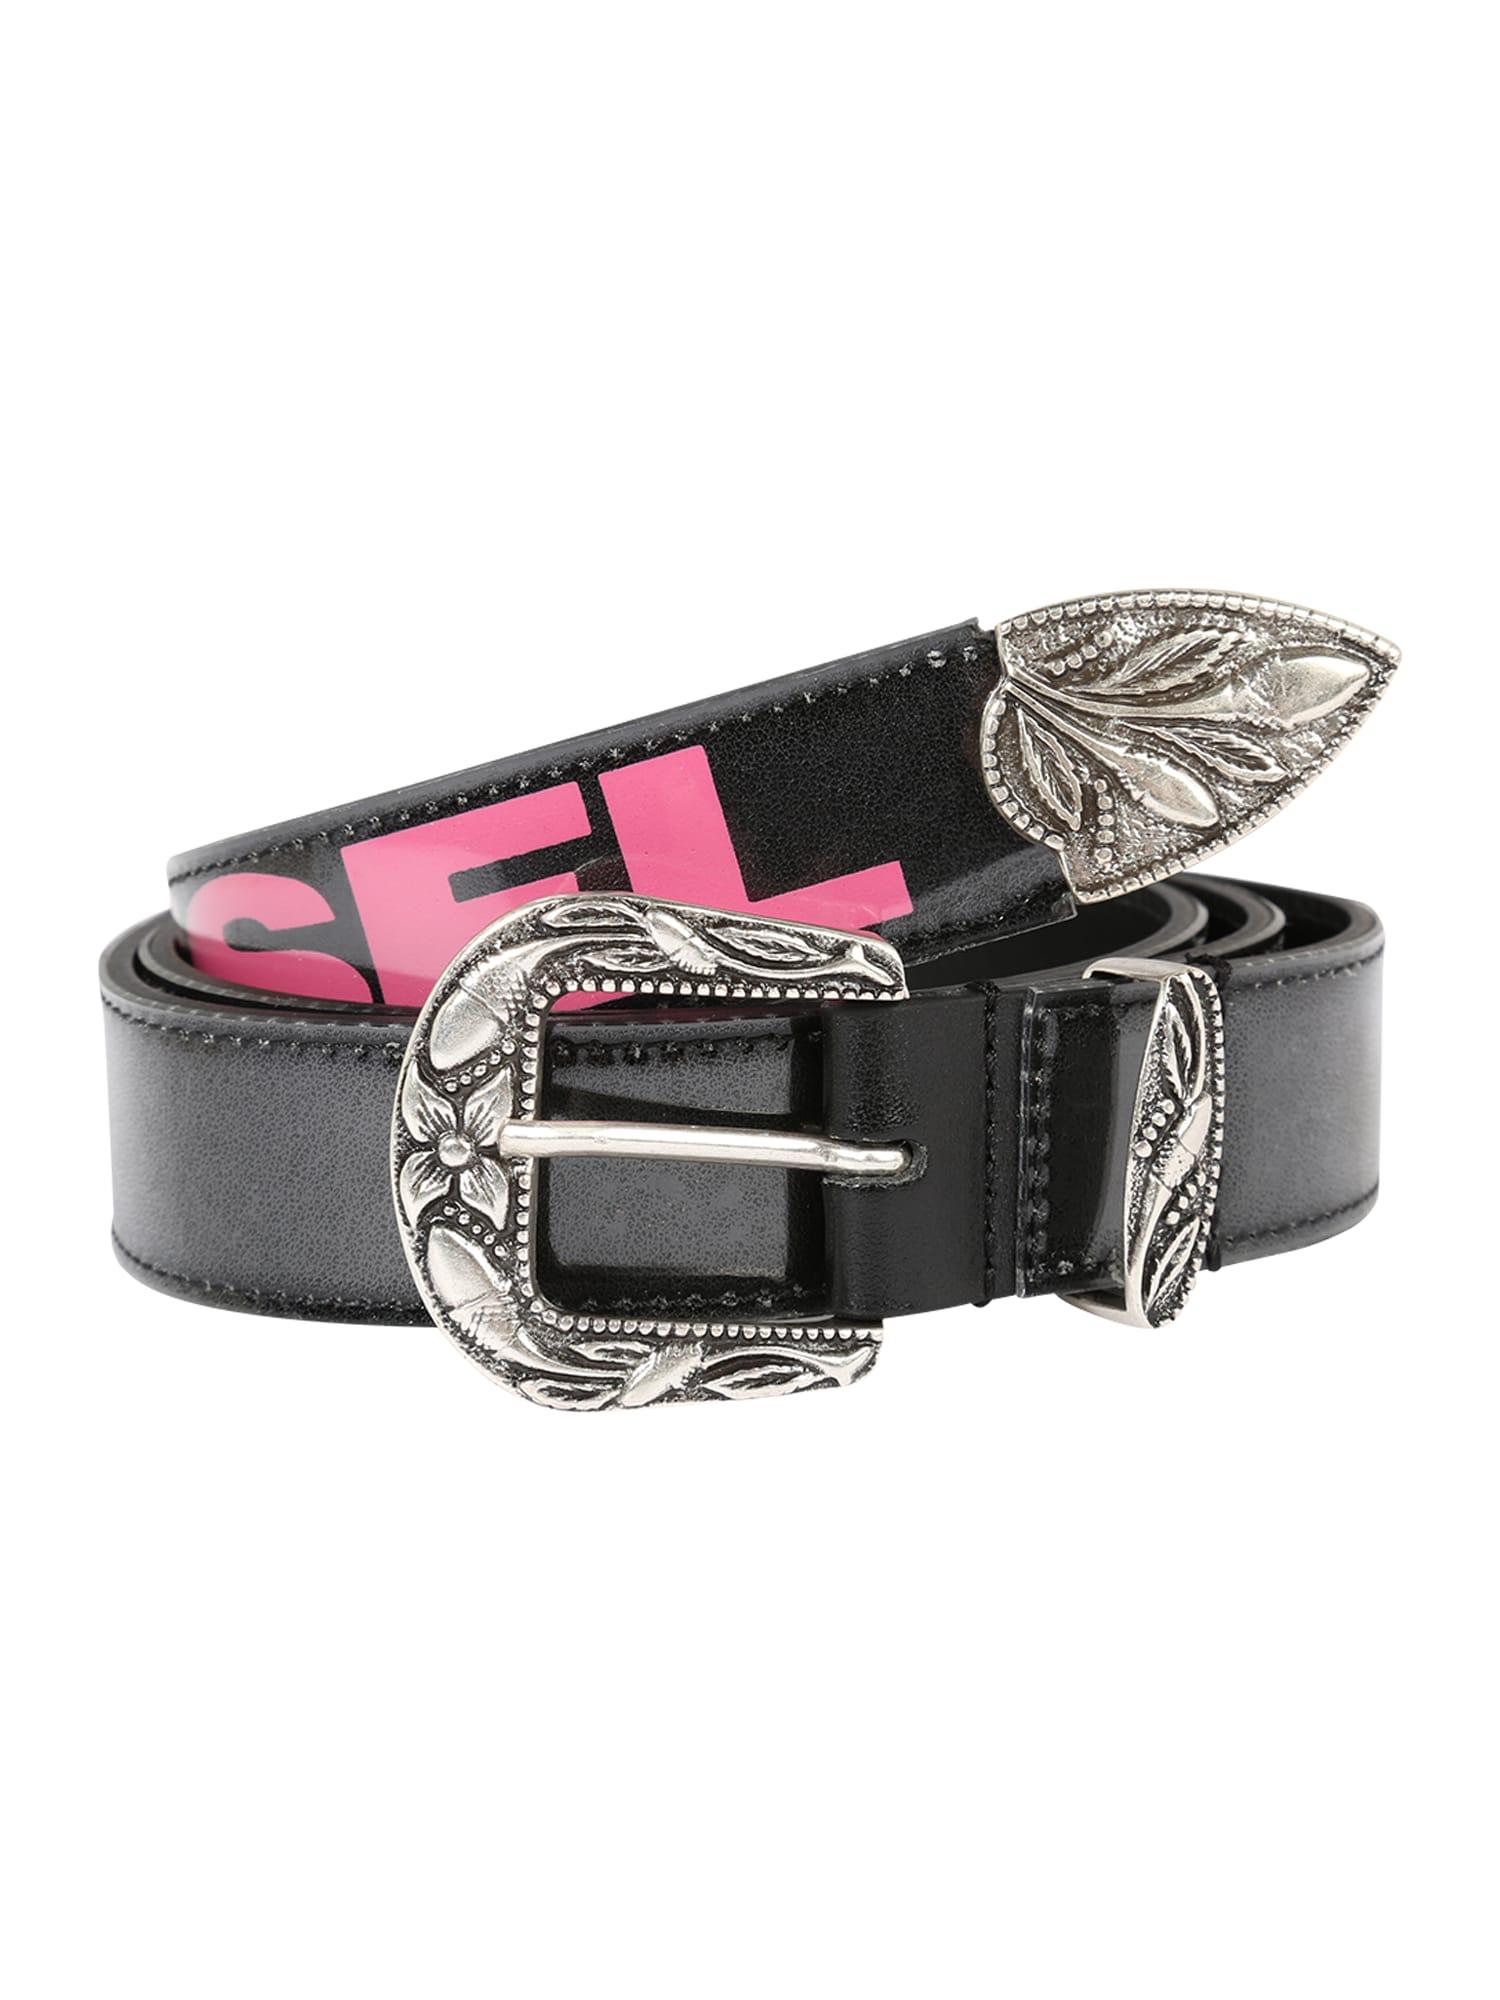 Opasek - B-STIC-F - belt černá DIESEL